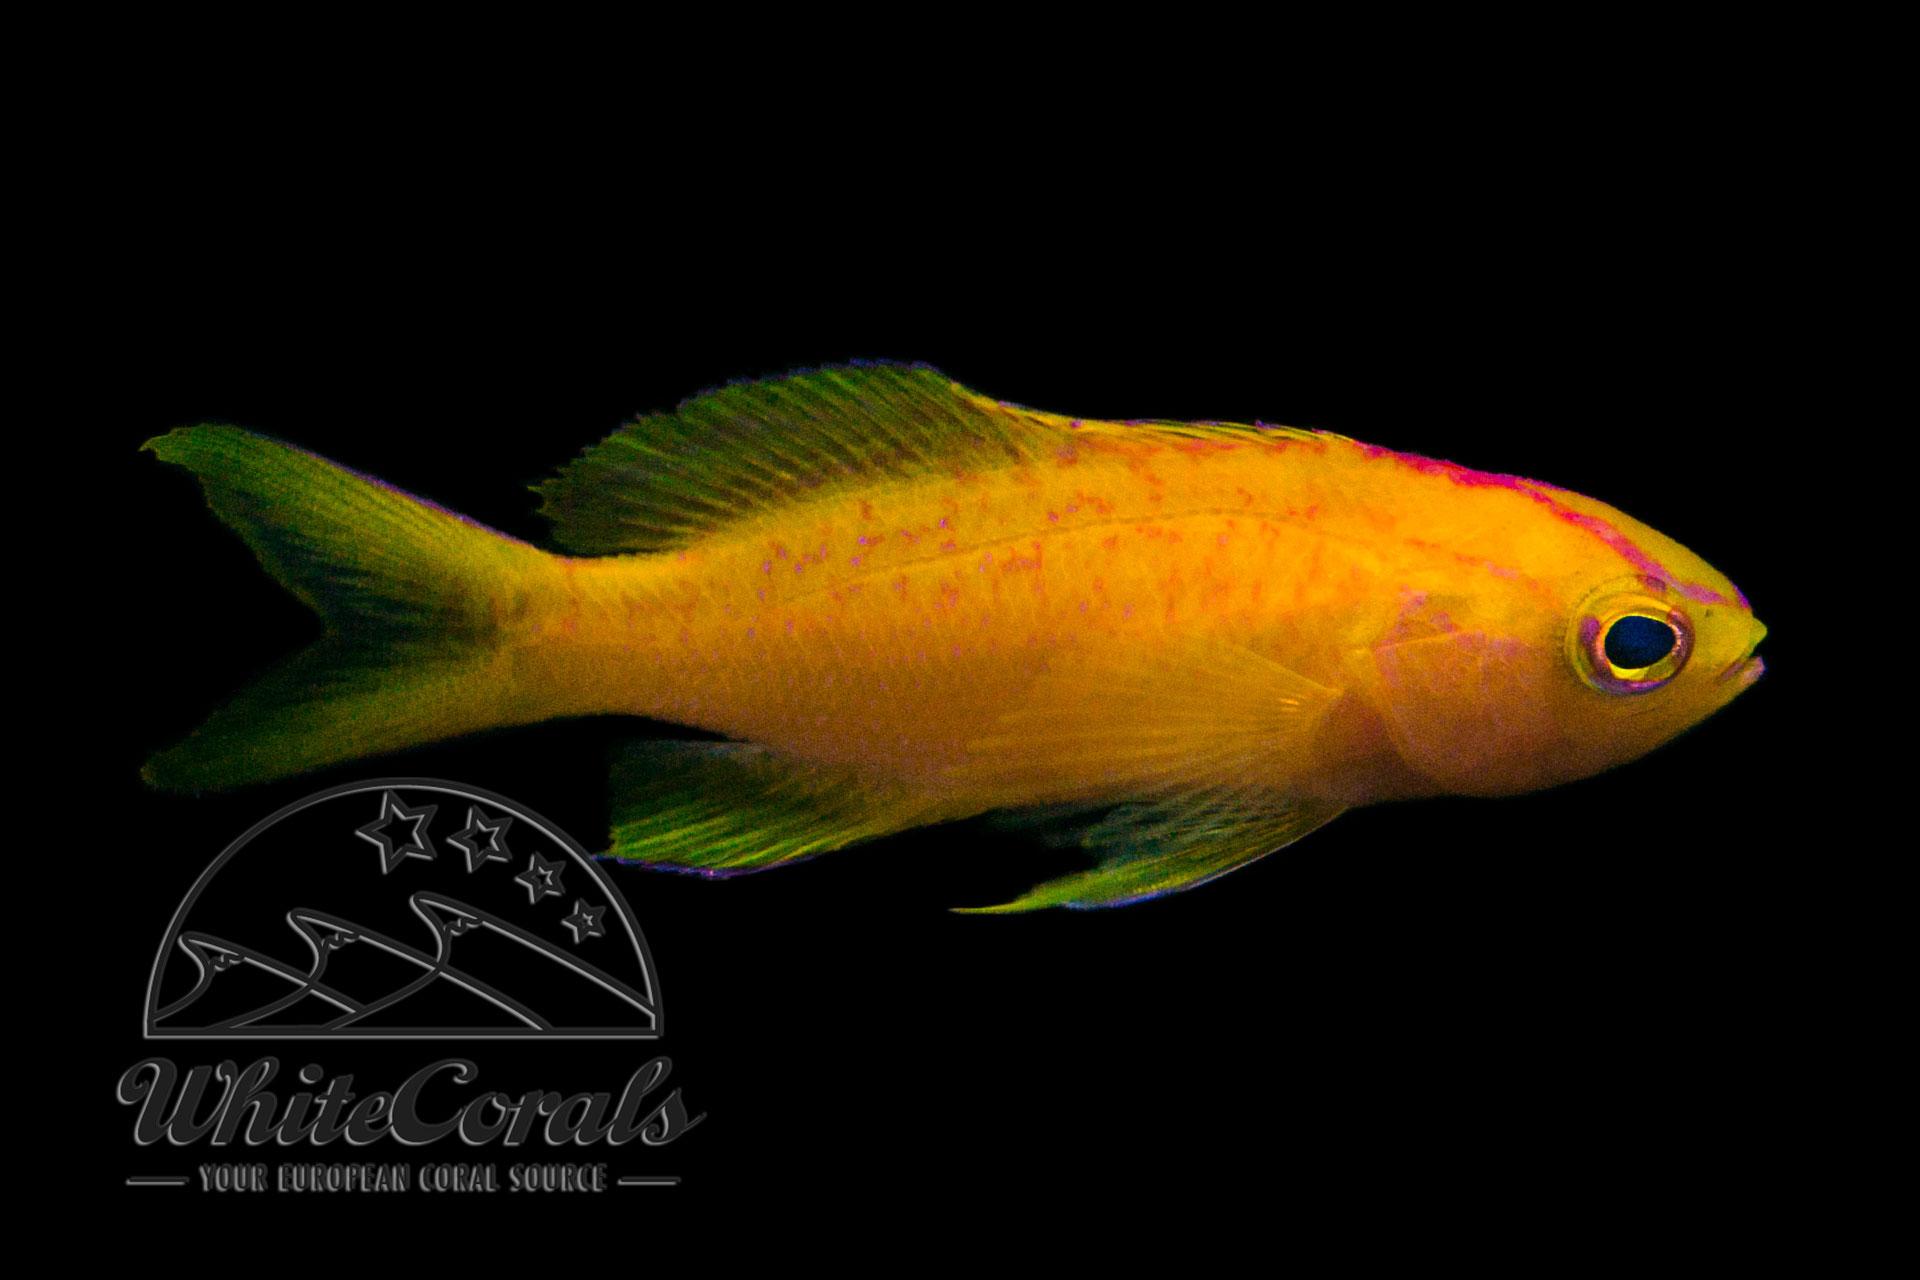 Pseudanthias parvirostris - Diadem-Fahnenbarsch (Weibchen)